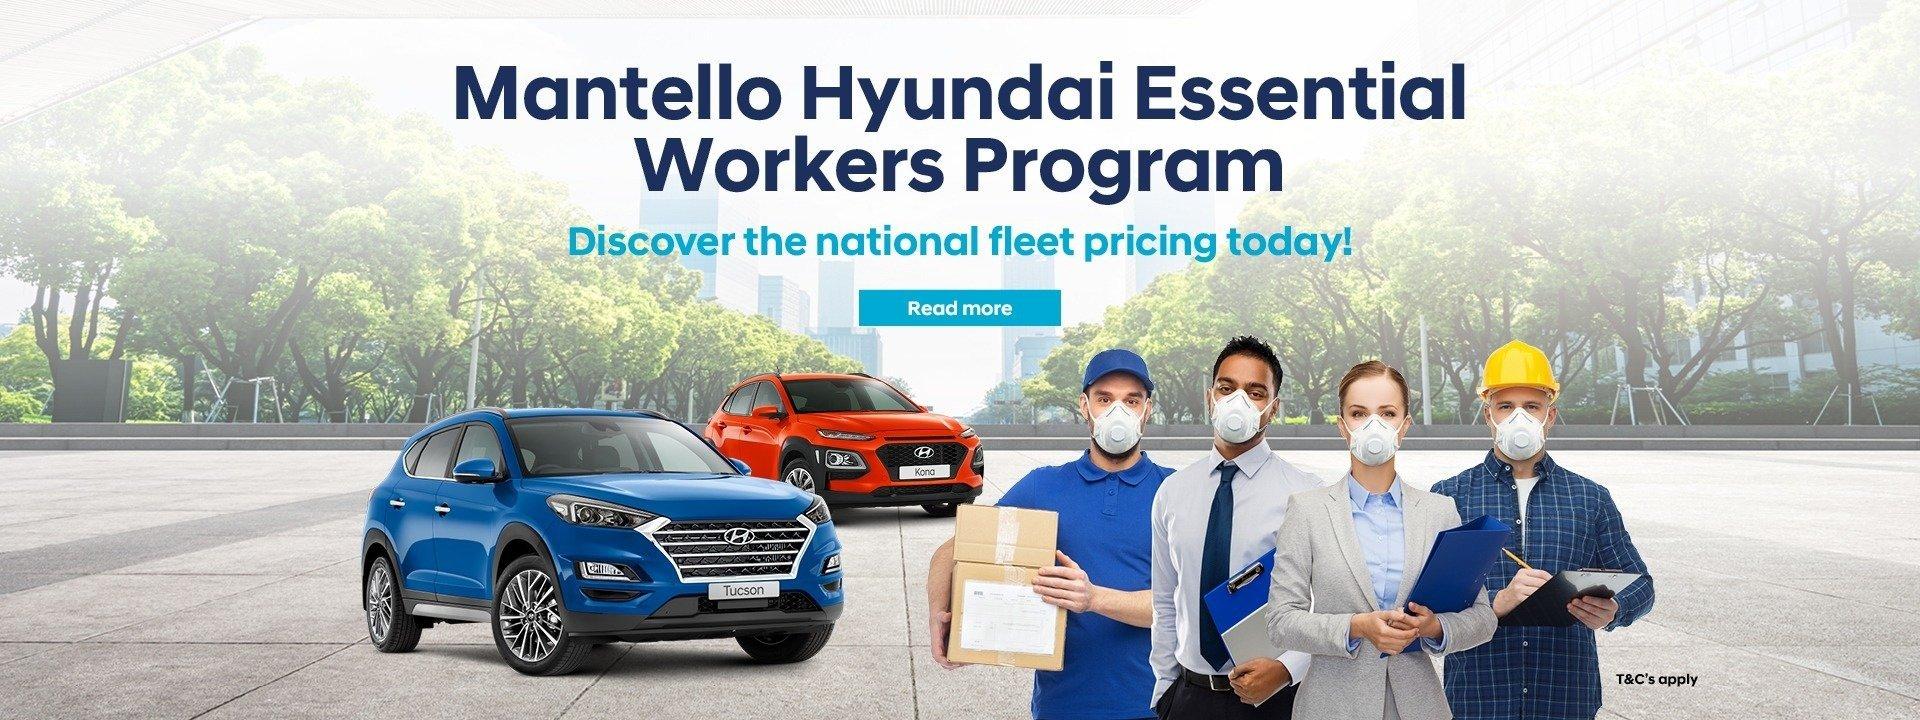 Essential Workers Program